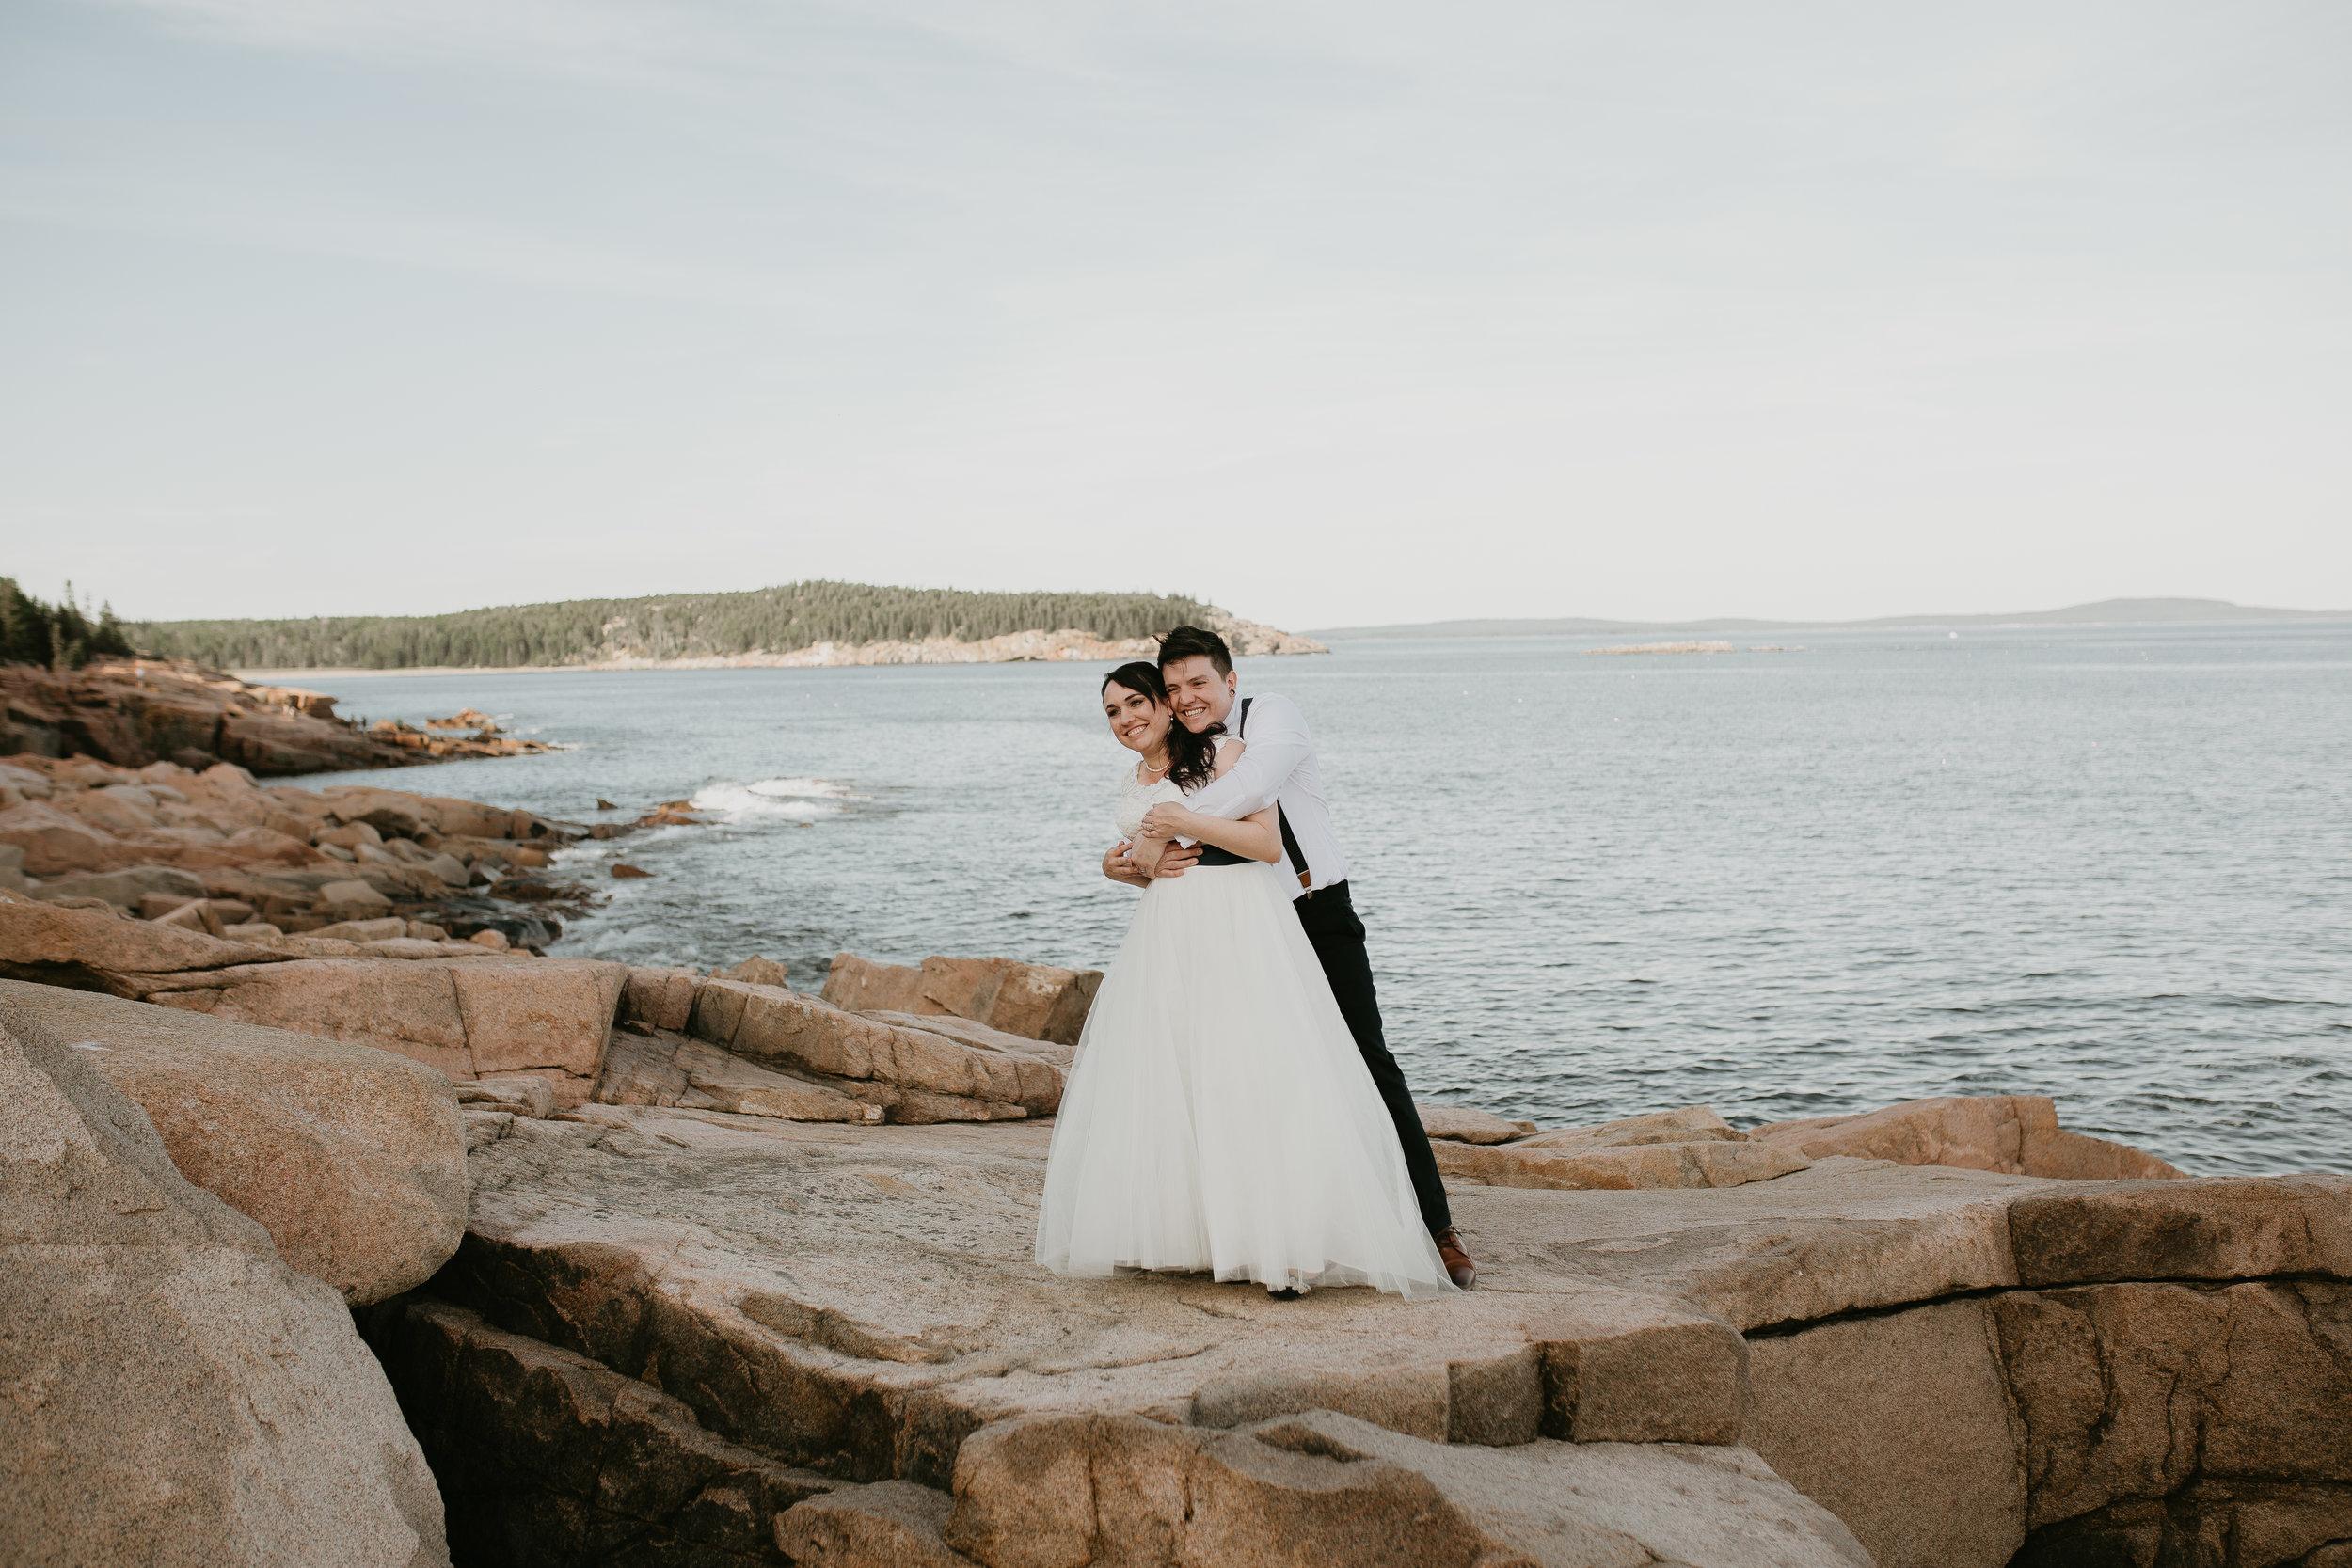 nicole-daacke-photography-Elopement-rocky-shoreline-coast-Acadia-National-Park-elopement-photographer-inspiration-maine-elopement-otter-cliffs-schoonic-head-point-44.jpg